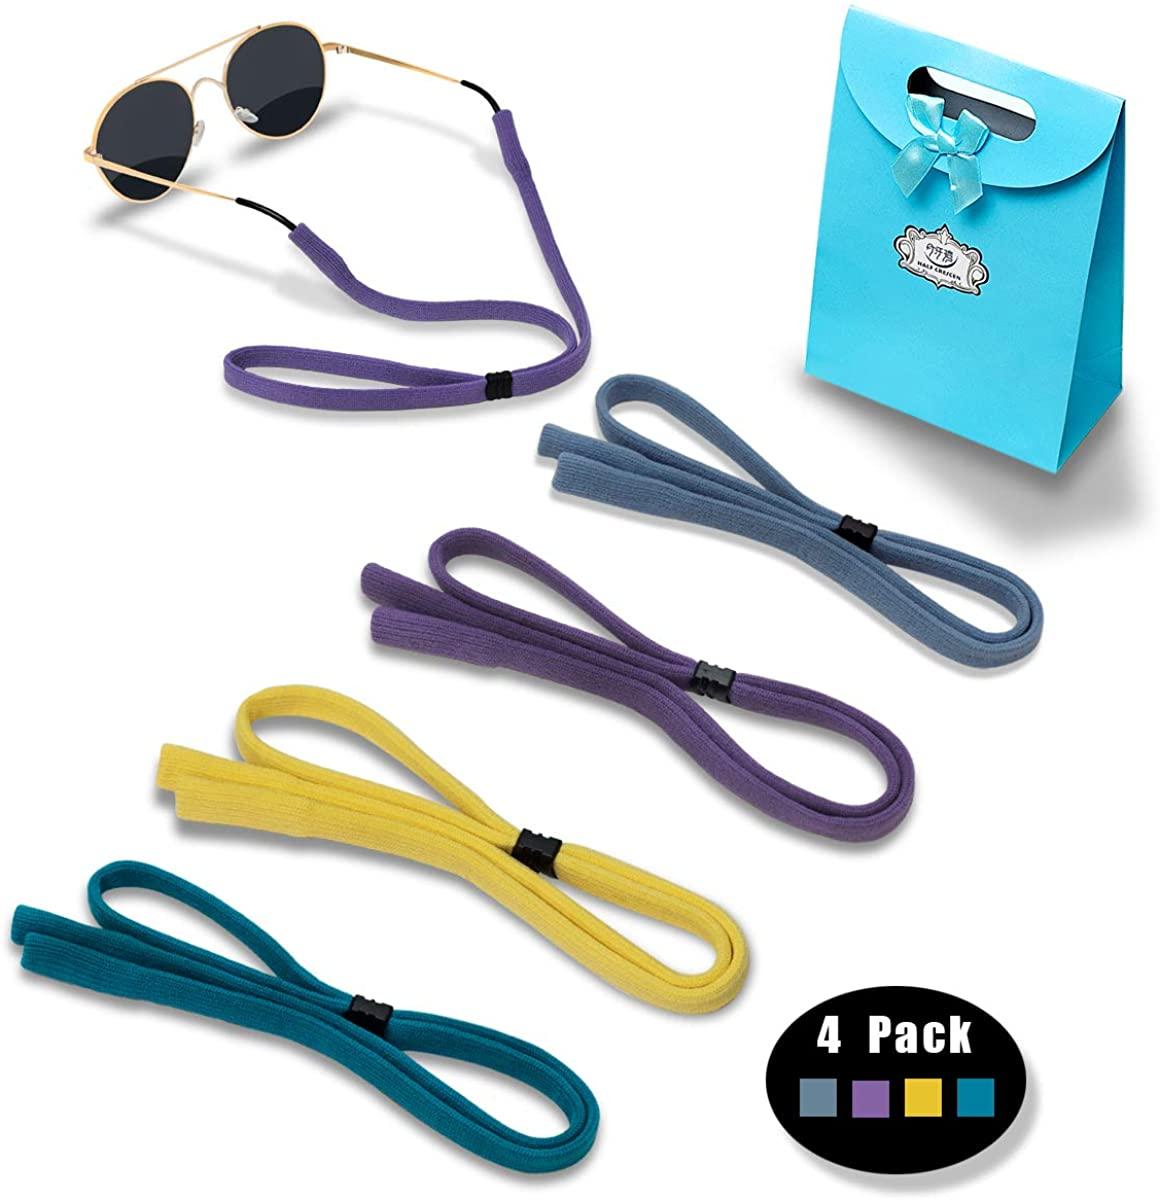 Original (elastic nylon/spandex) Standard End Glasses Straps, Sports Adjustable Eyewear Retainer for Men Women